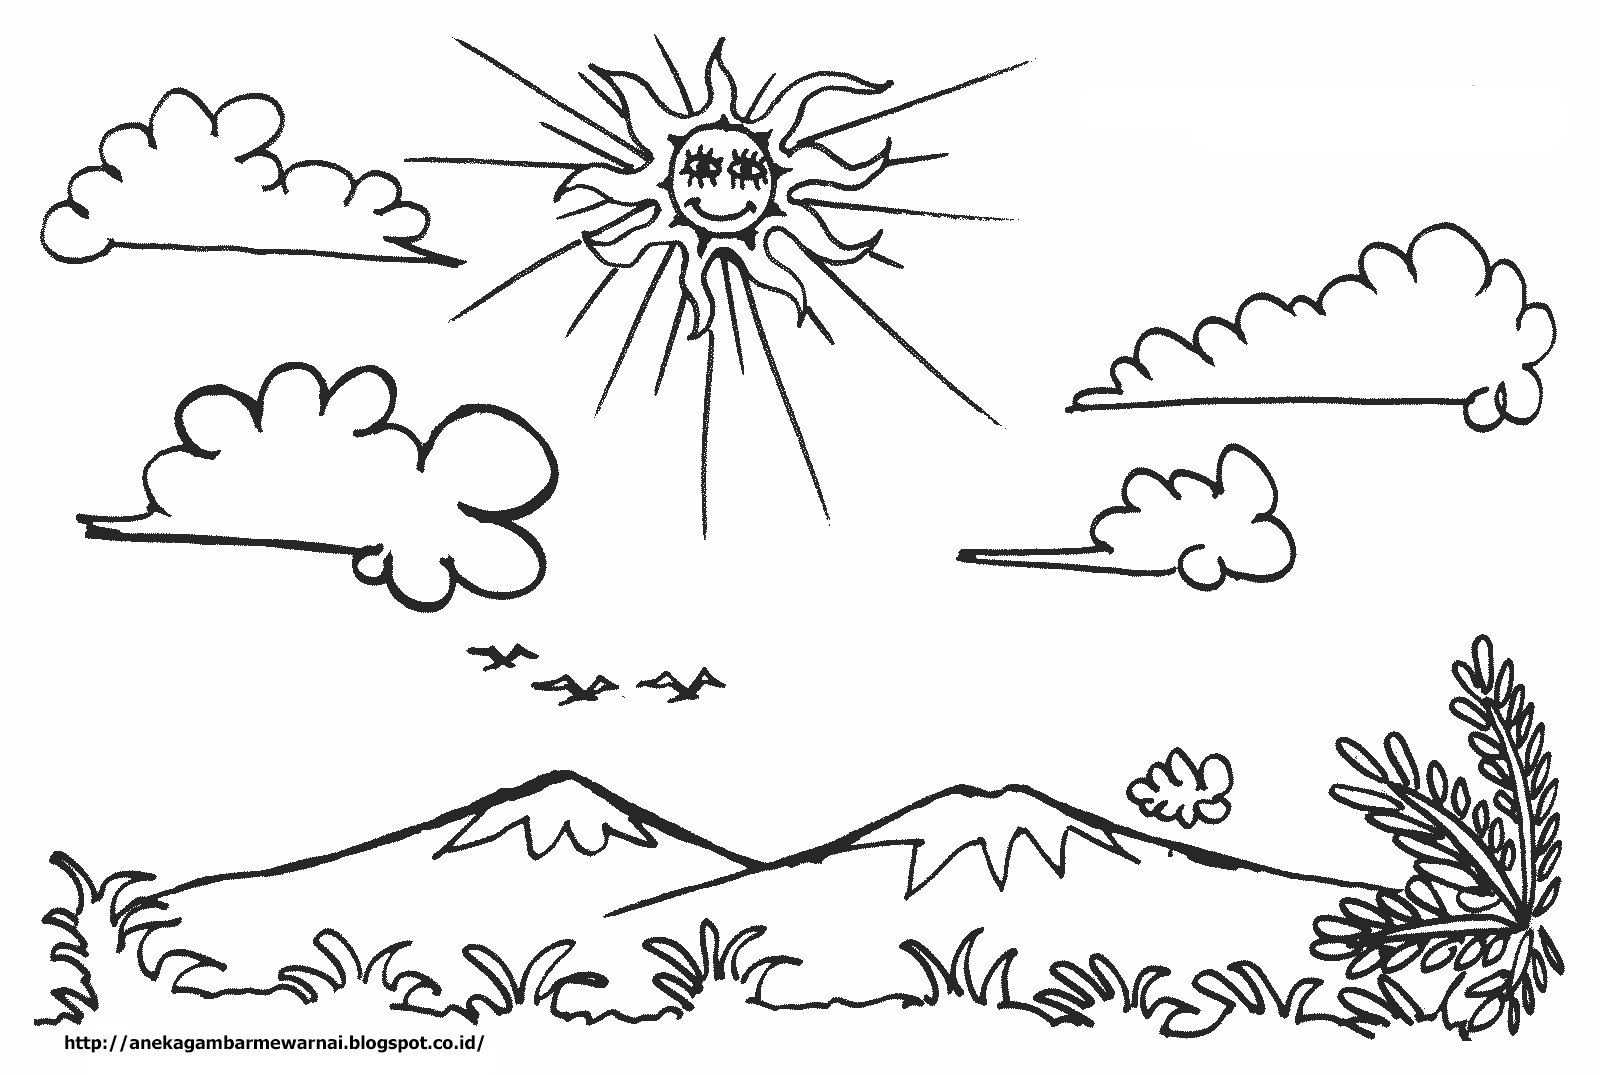 Gambar Mewarnai Anak Ayam Pinterest Bunga Pemandangan Langit Cerah Paud